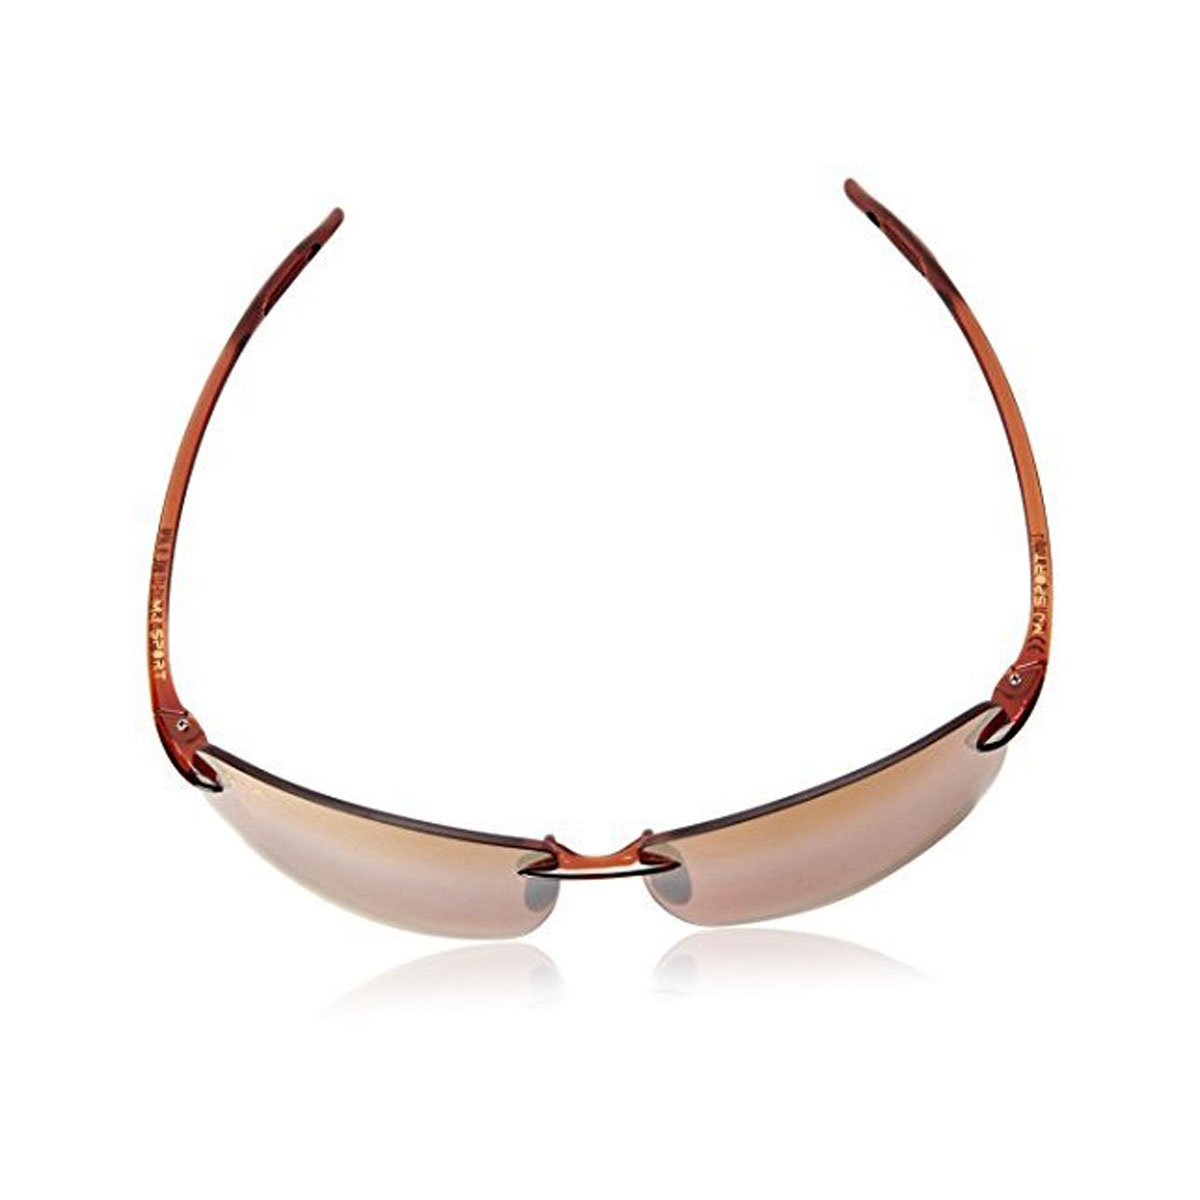 387ea0bc5c09 ... Image of Maui Jim Lighthouse Sunglasses - HCL Bronze Lens ...